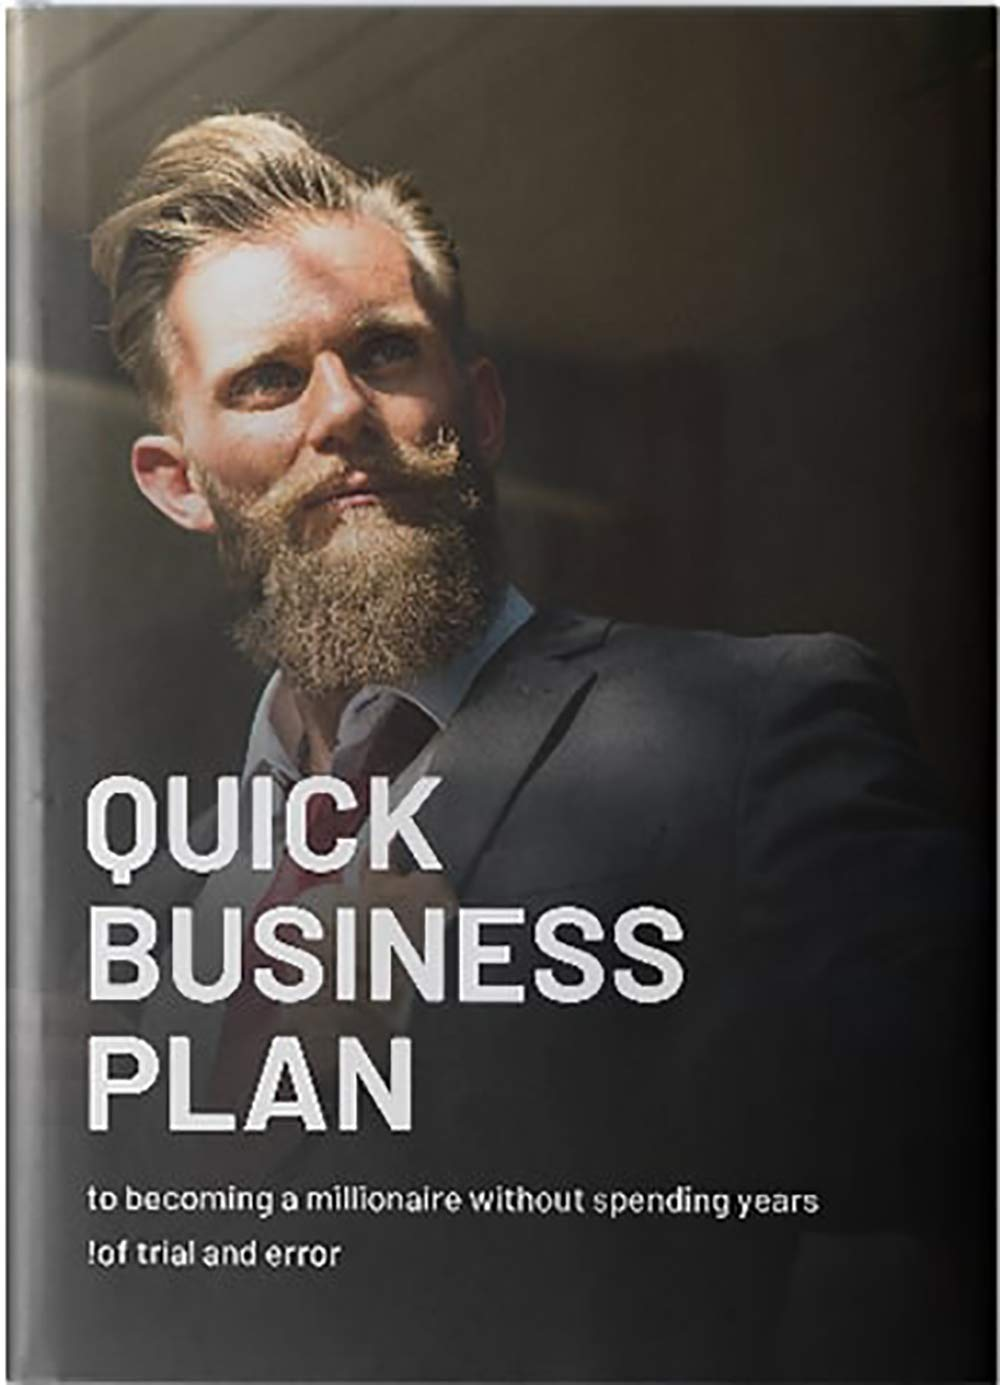 Instant Millionaire Blueprint by Arfeen Khan: Blueprint for starting your online business